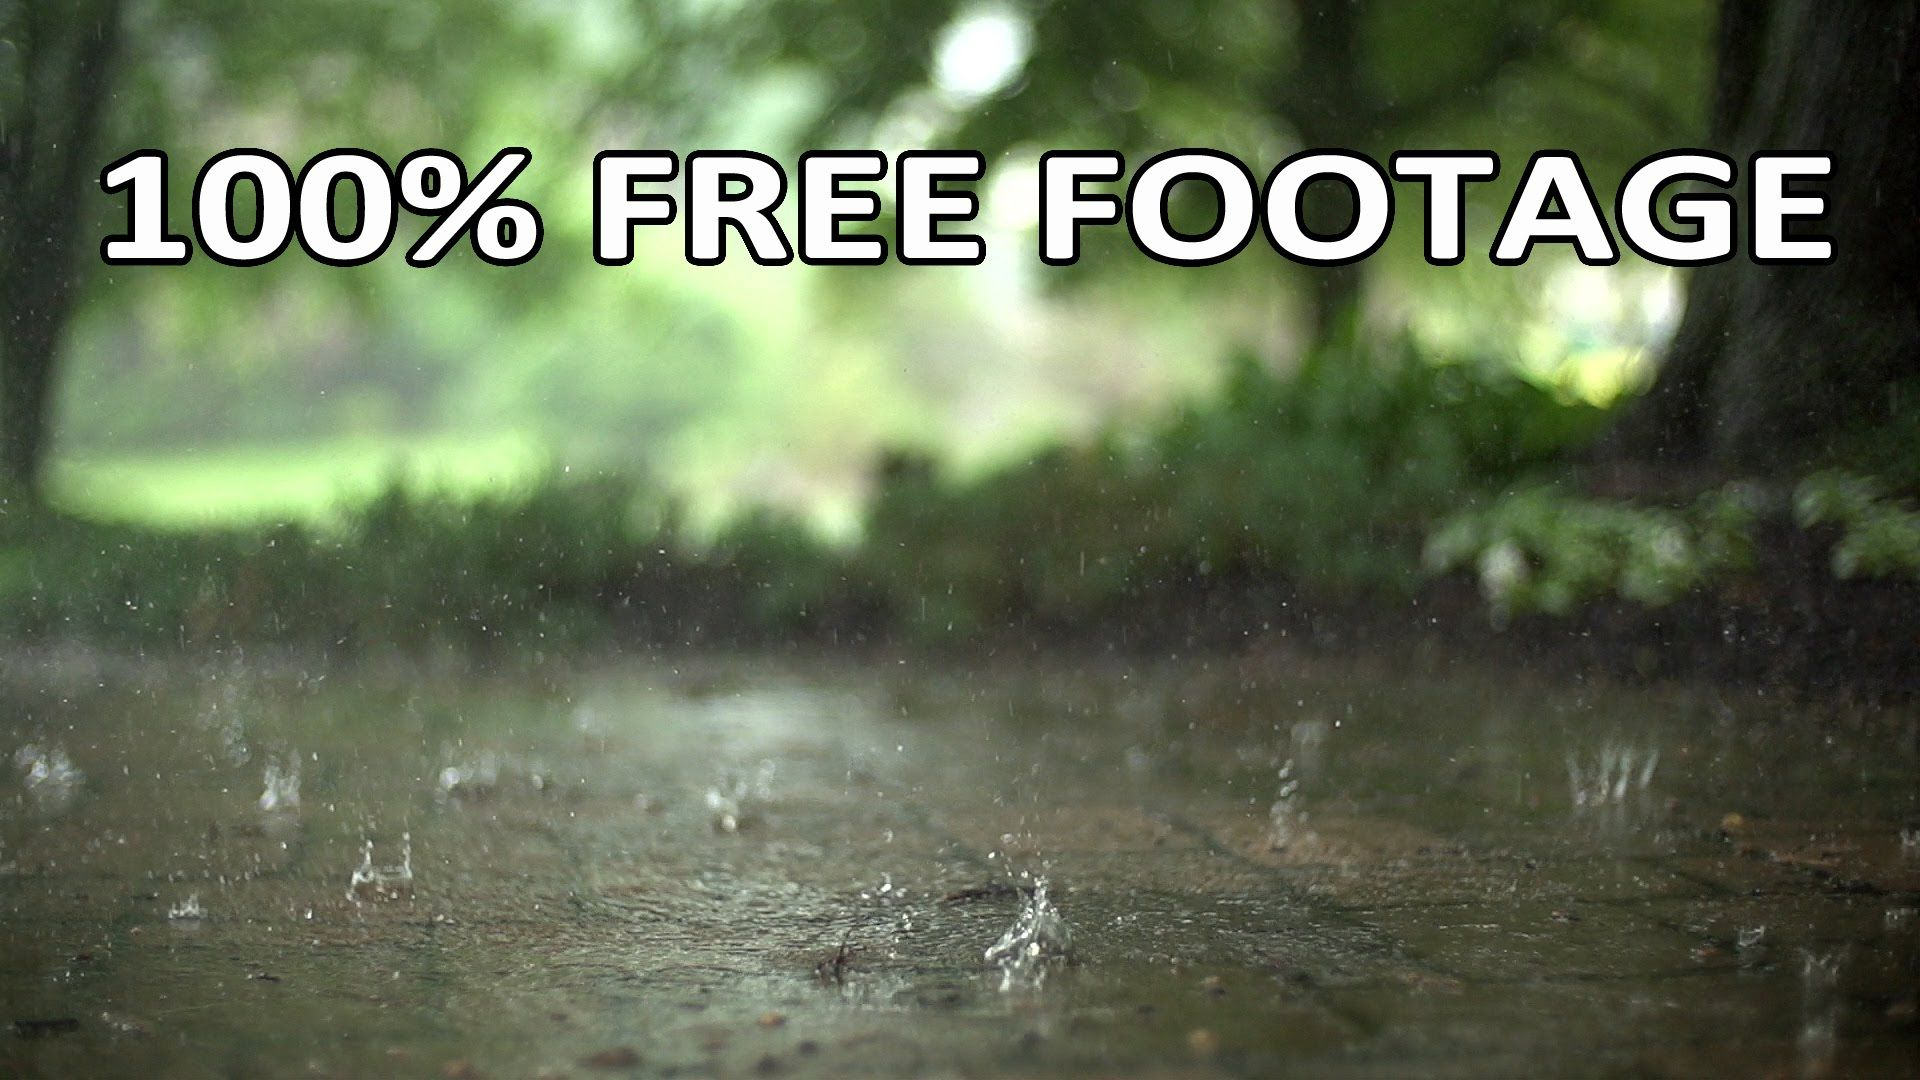 Beachfront B Roll Raindrops Free To Use Hd Stock Video Footage Stock Video Video Footage Free Stock Video